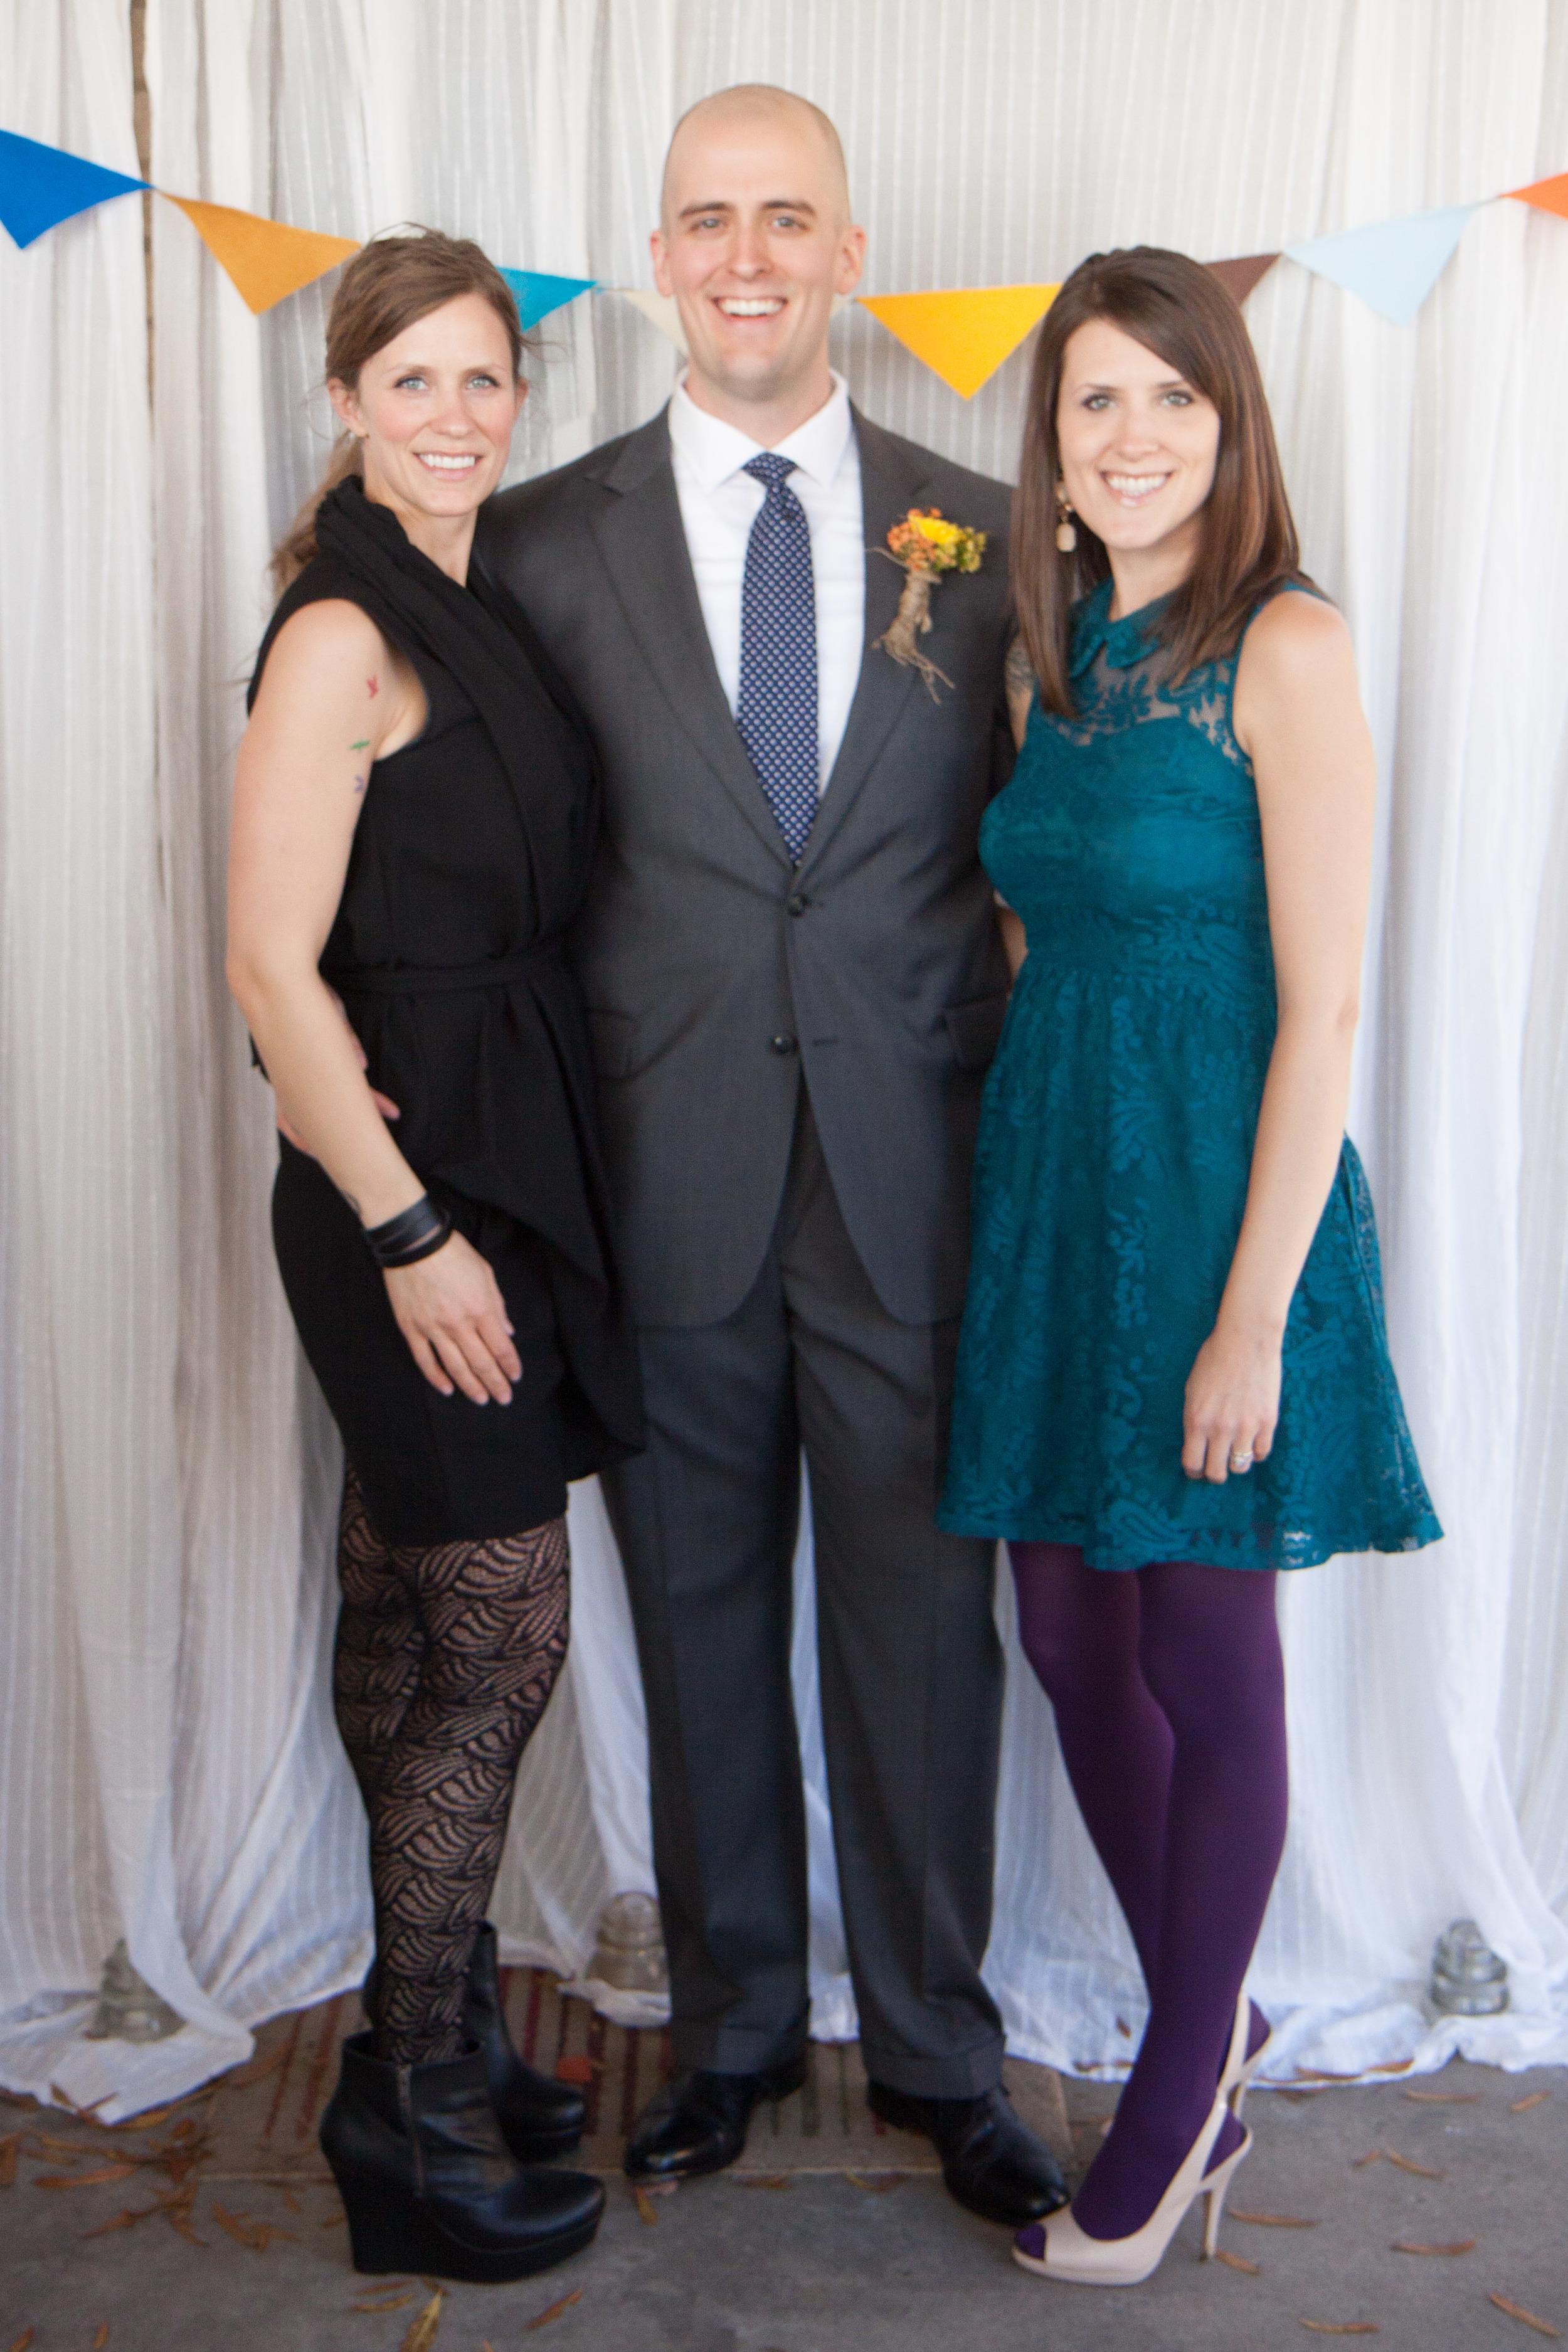 Wilson Bickel Wedding - Family Photos (1 of 25).jpg